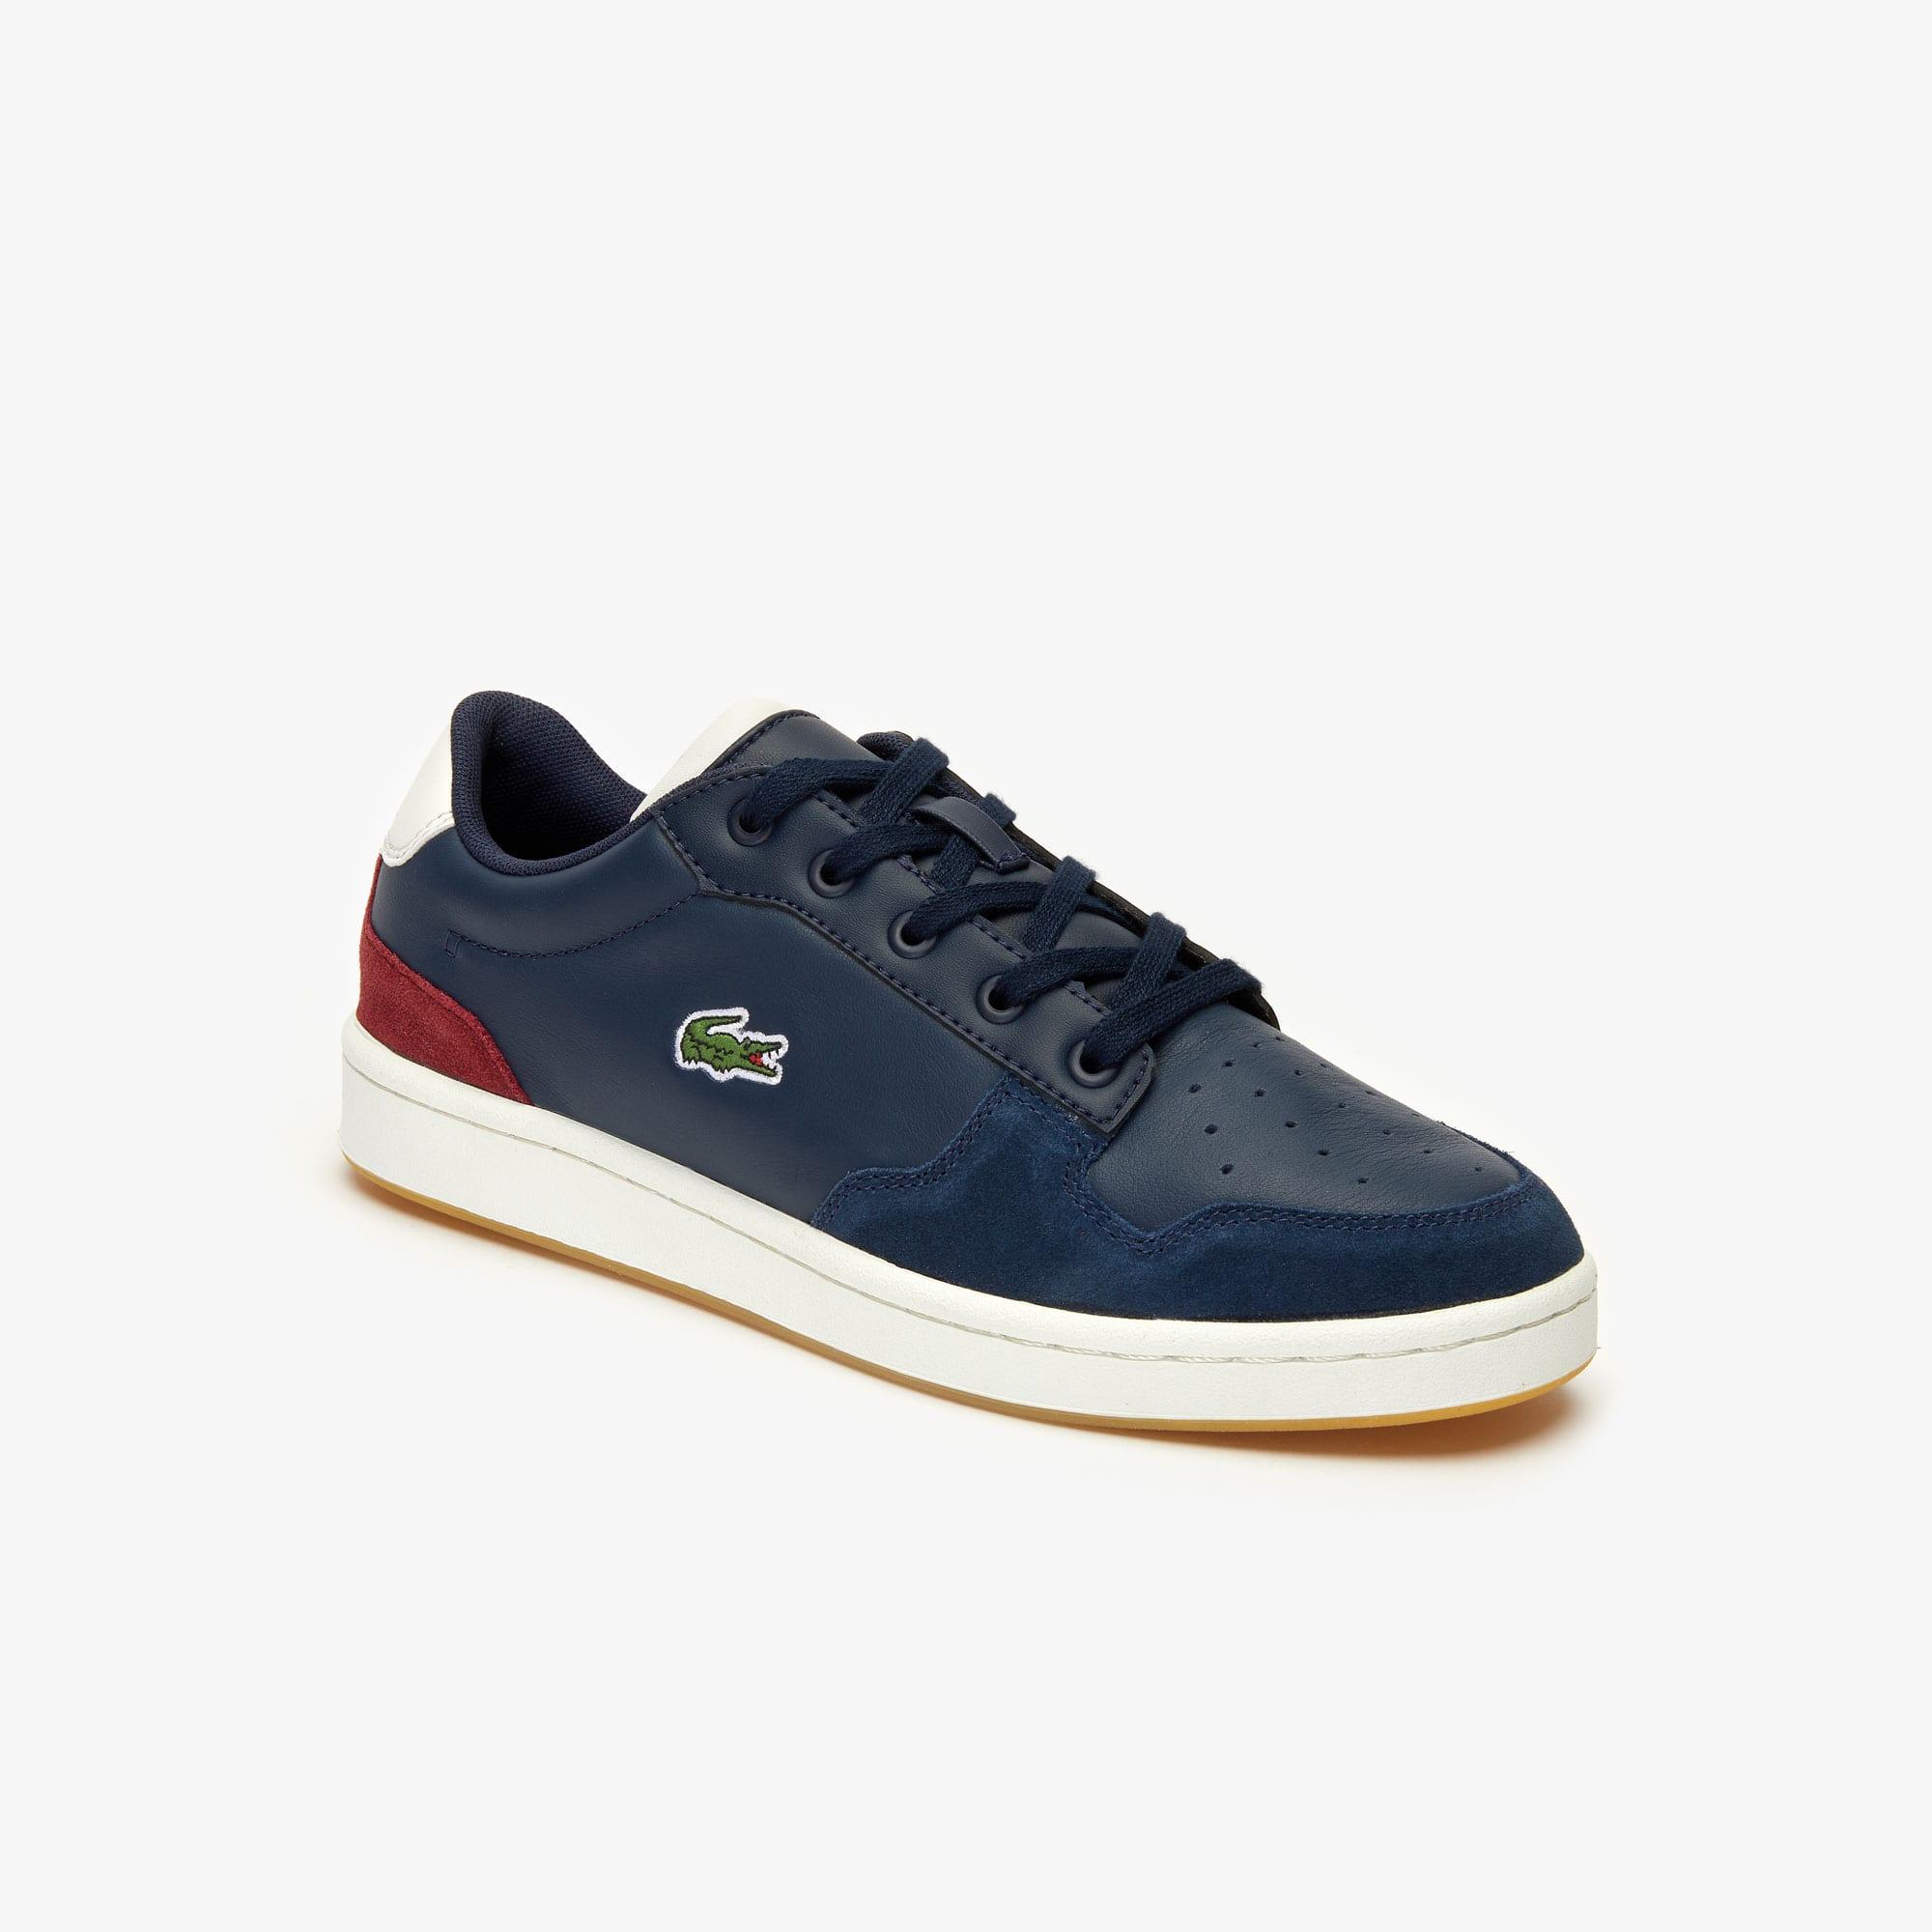 2e5a7a6a69271 Shoes for Women | Footwear | LACOSTE